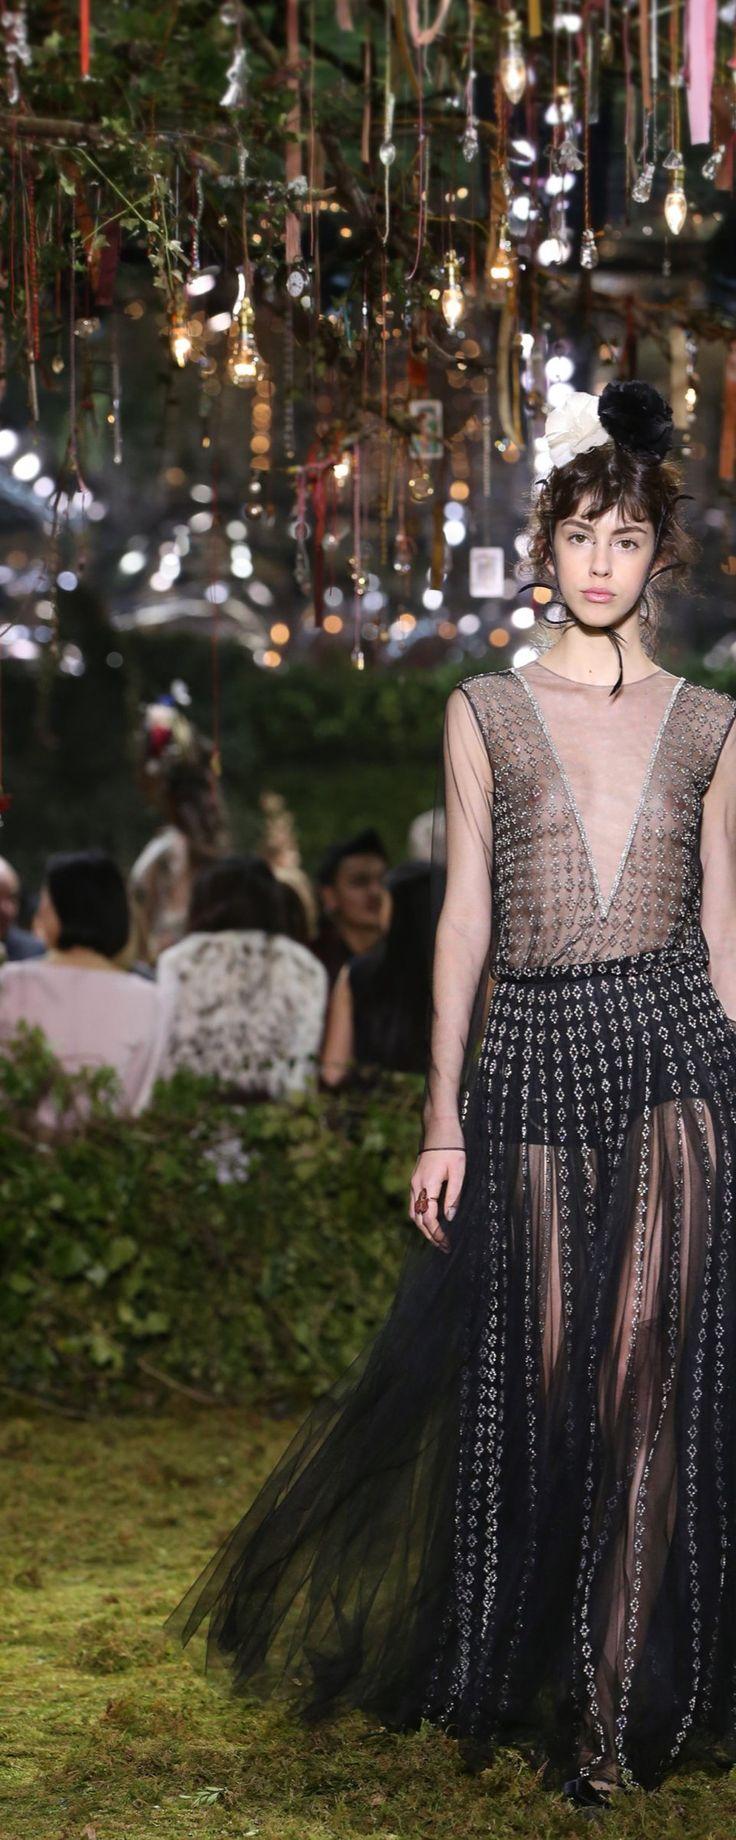 "Christian Dior Official pictures, S/S 2017 - Couture - ""Parcours d'Esprit"" - Black and pink tulle decolleté jumpsuit with silver losange embroideries. Feather carnation bandeau. - http://www.orientpalms.com/Christian-Dior-6609"